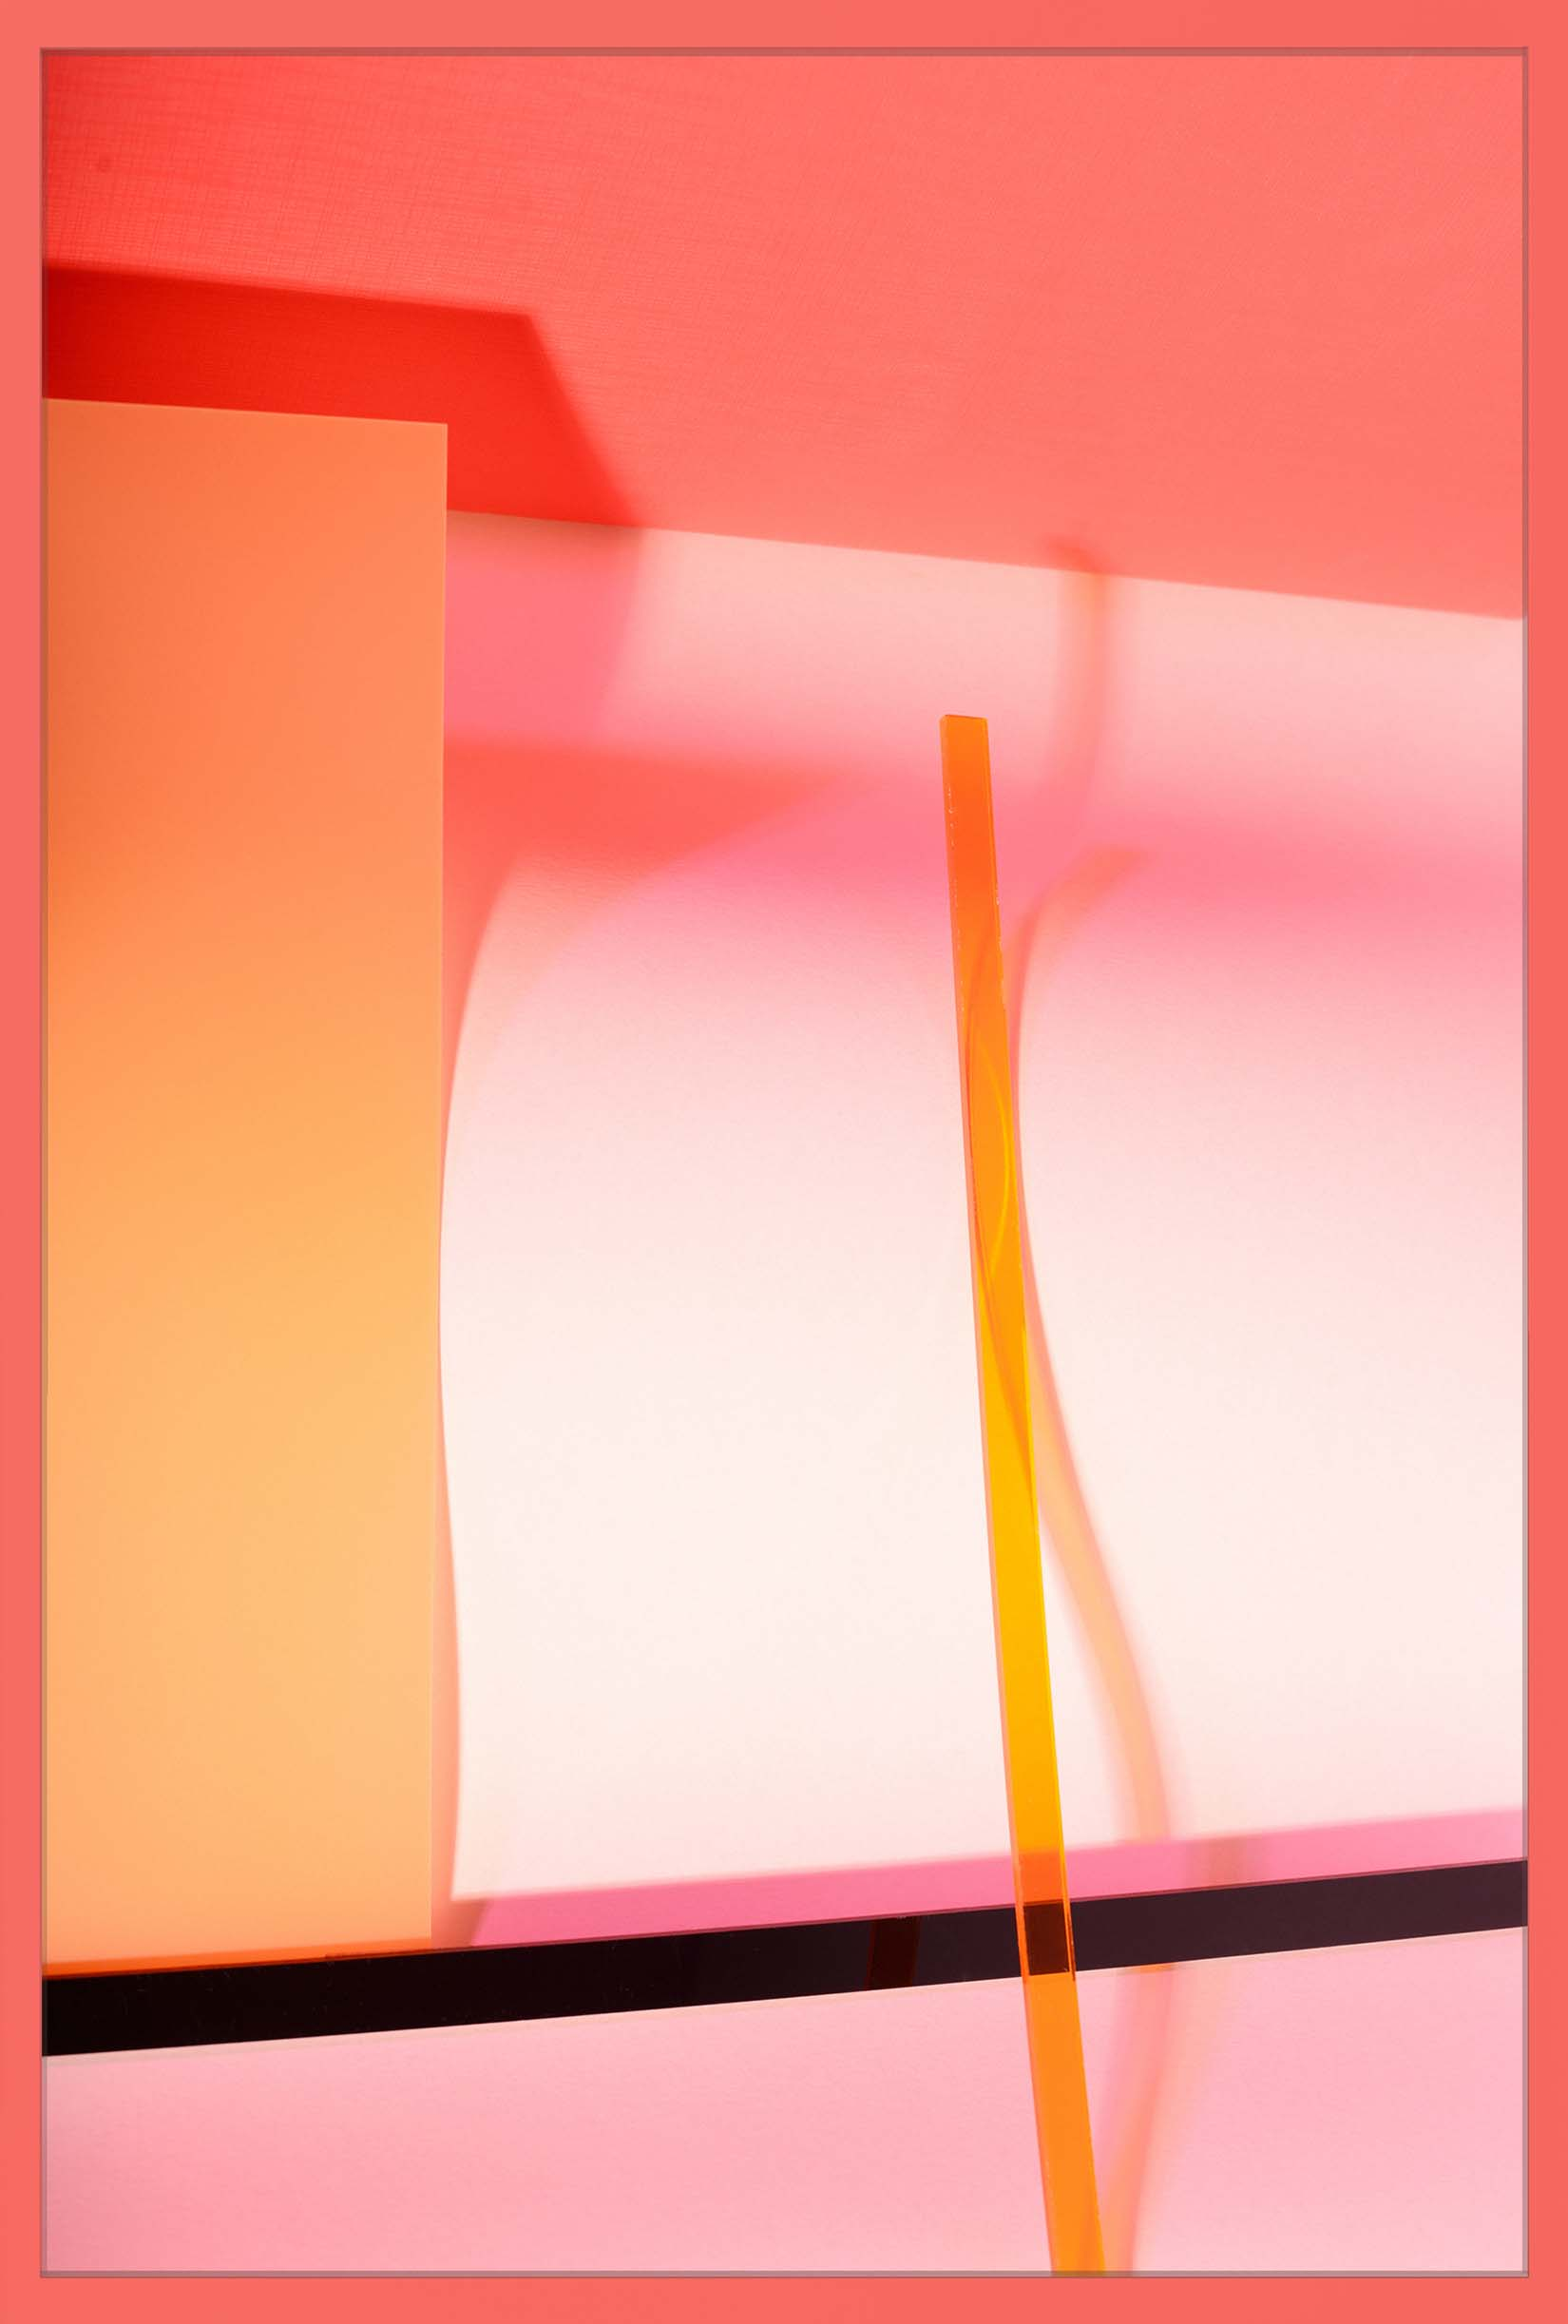 LYDIA WEGNER   Apricot Wave  2017 Archival inkjet print 80 x 53.5 cm